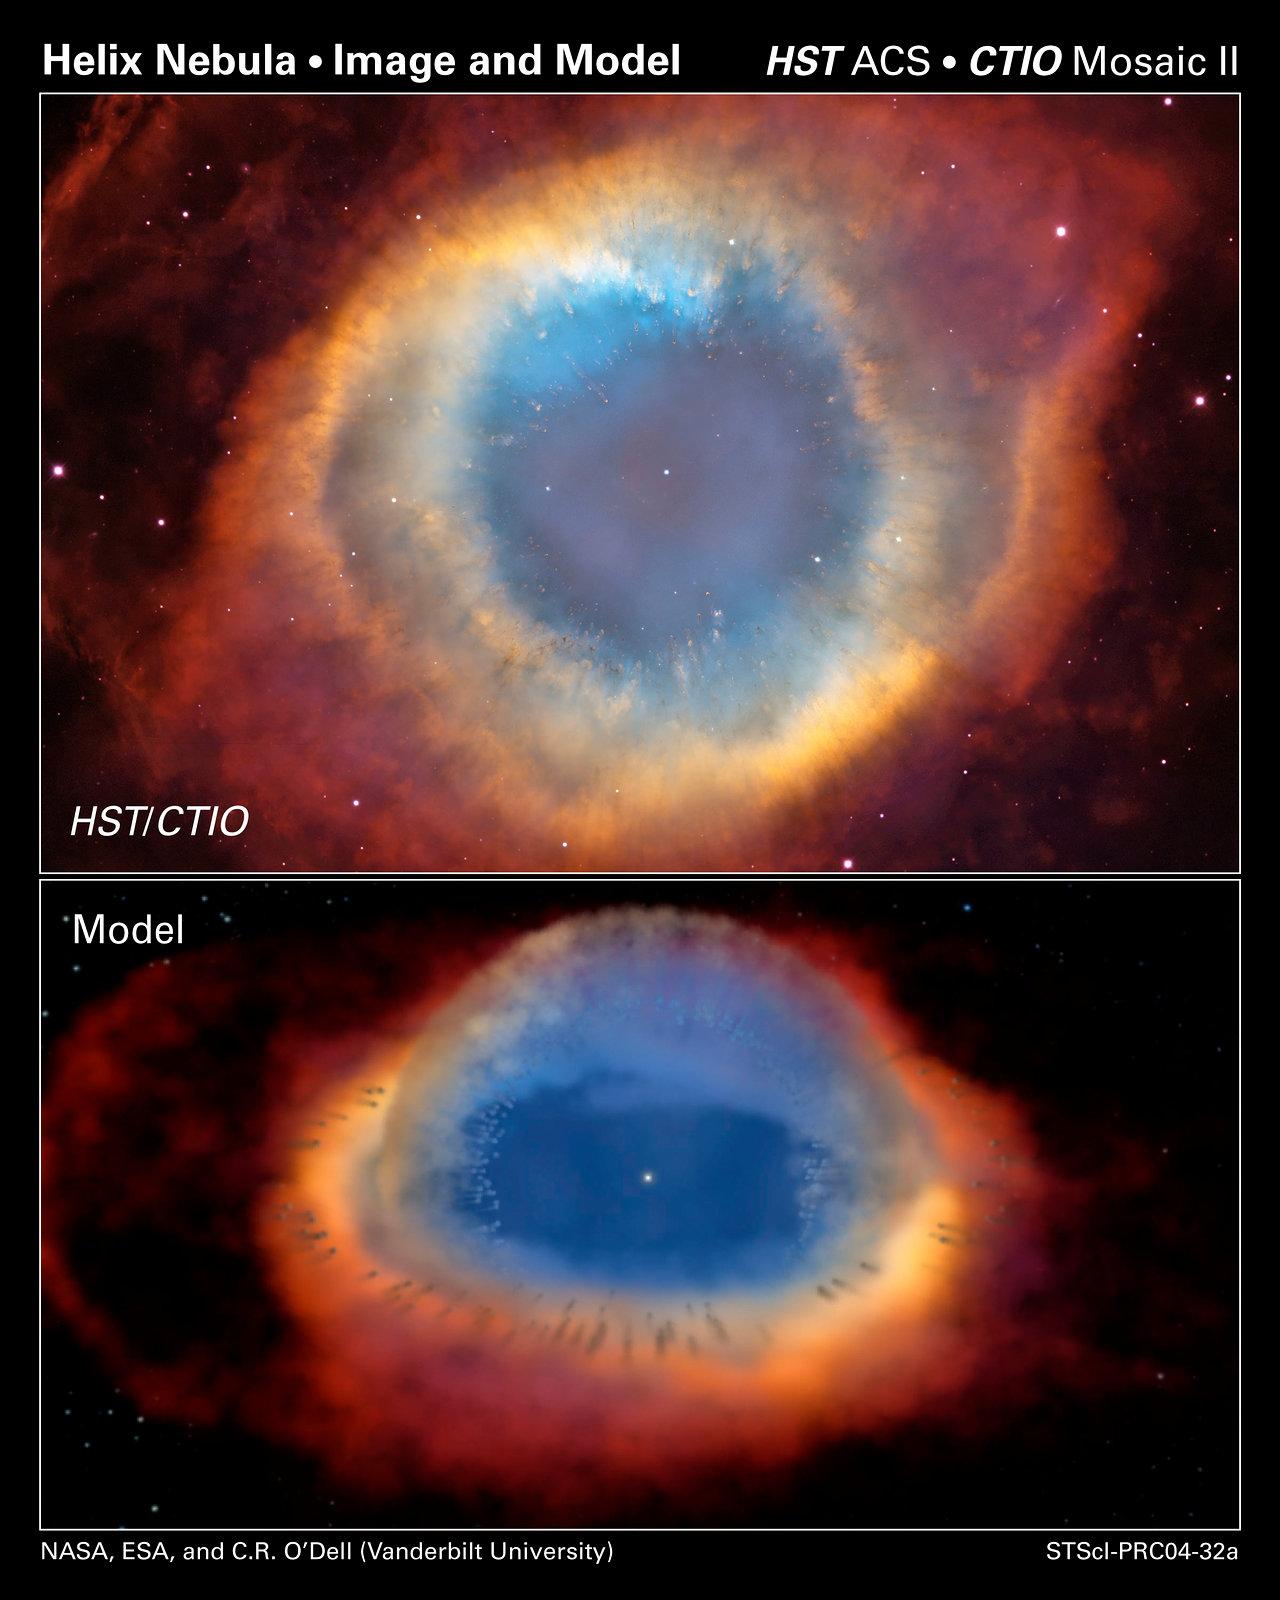 Two Views of a Nebula